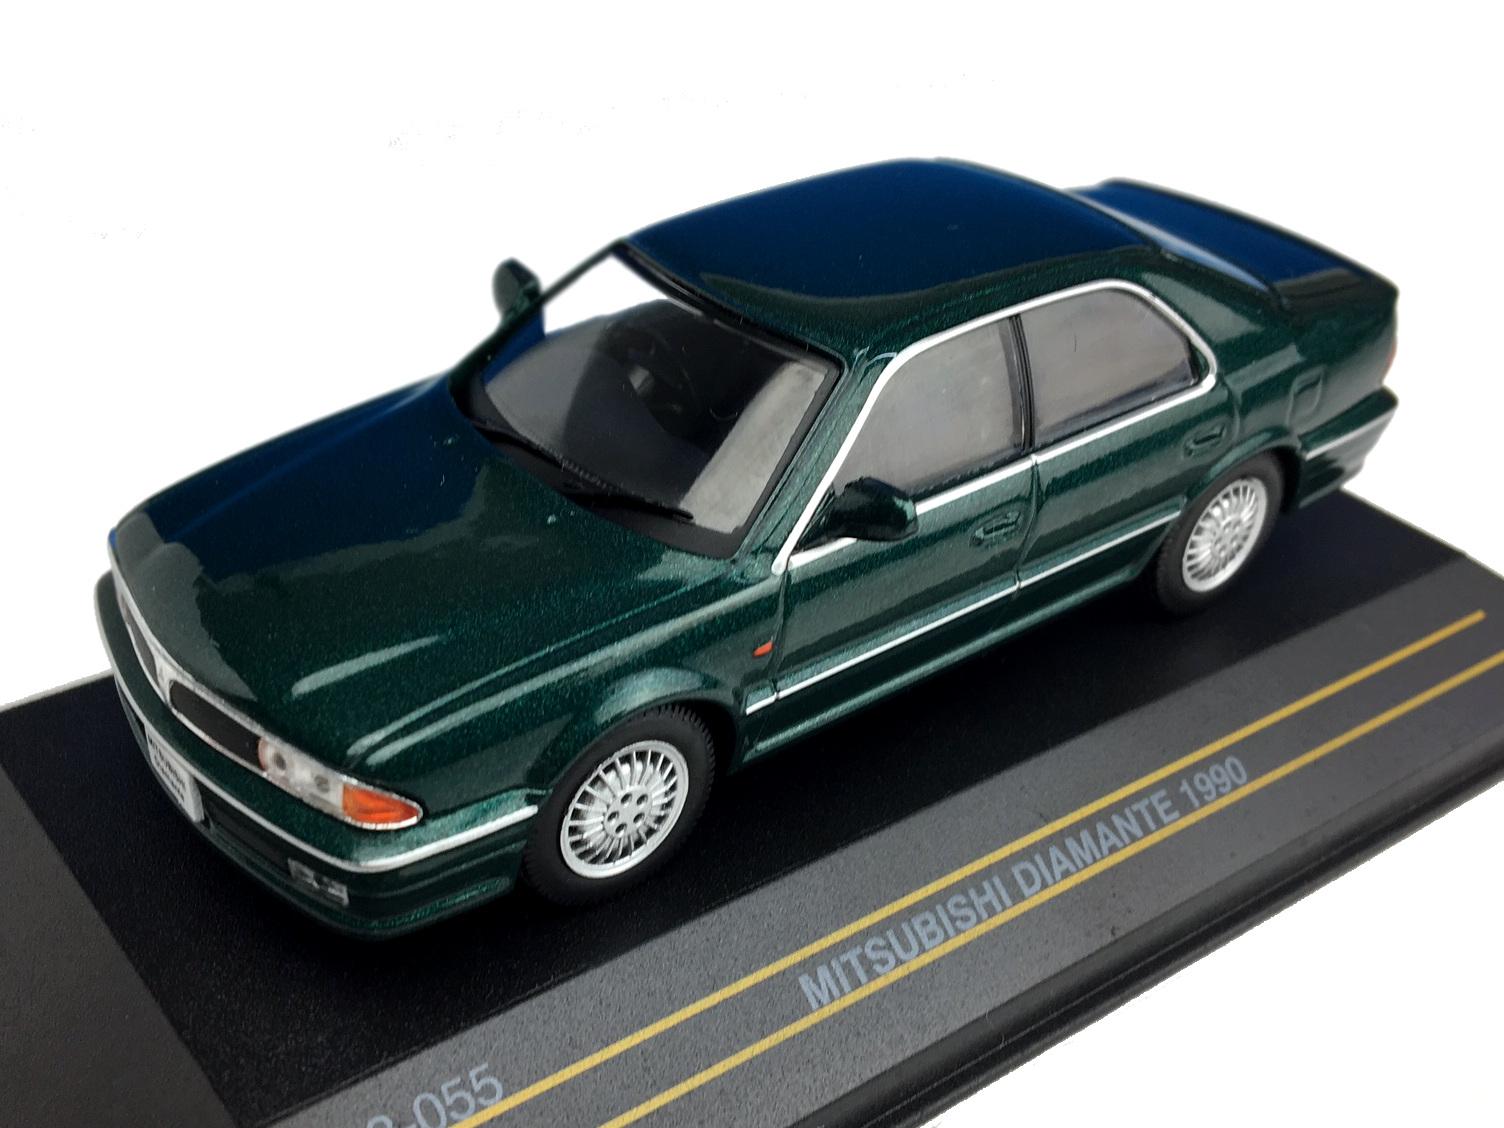 First43/ファースト43 三菱 ディアマンテ 1990 グリーン